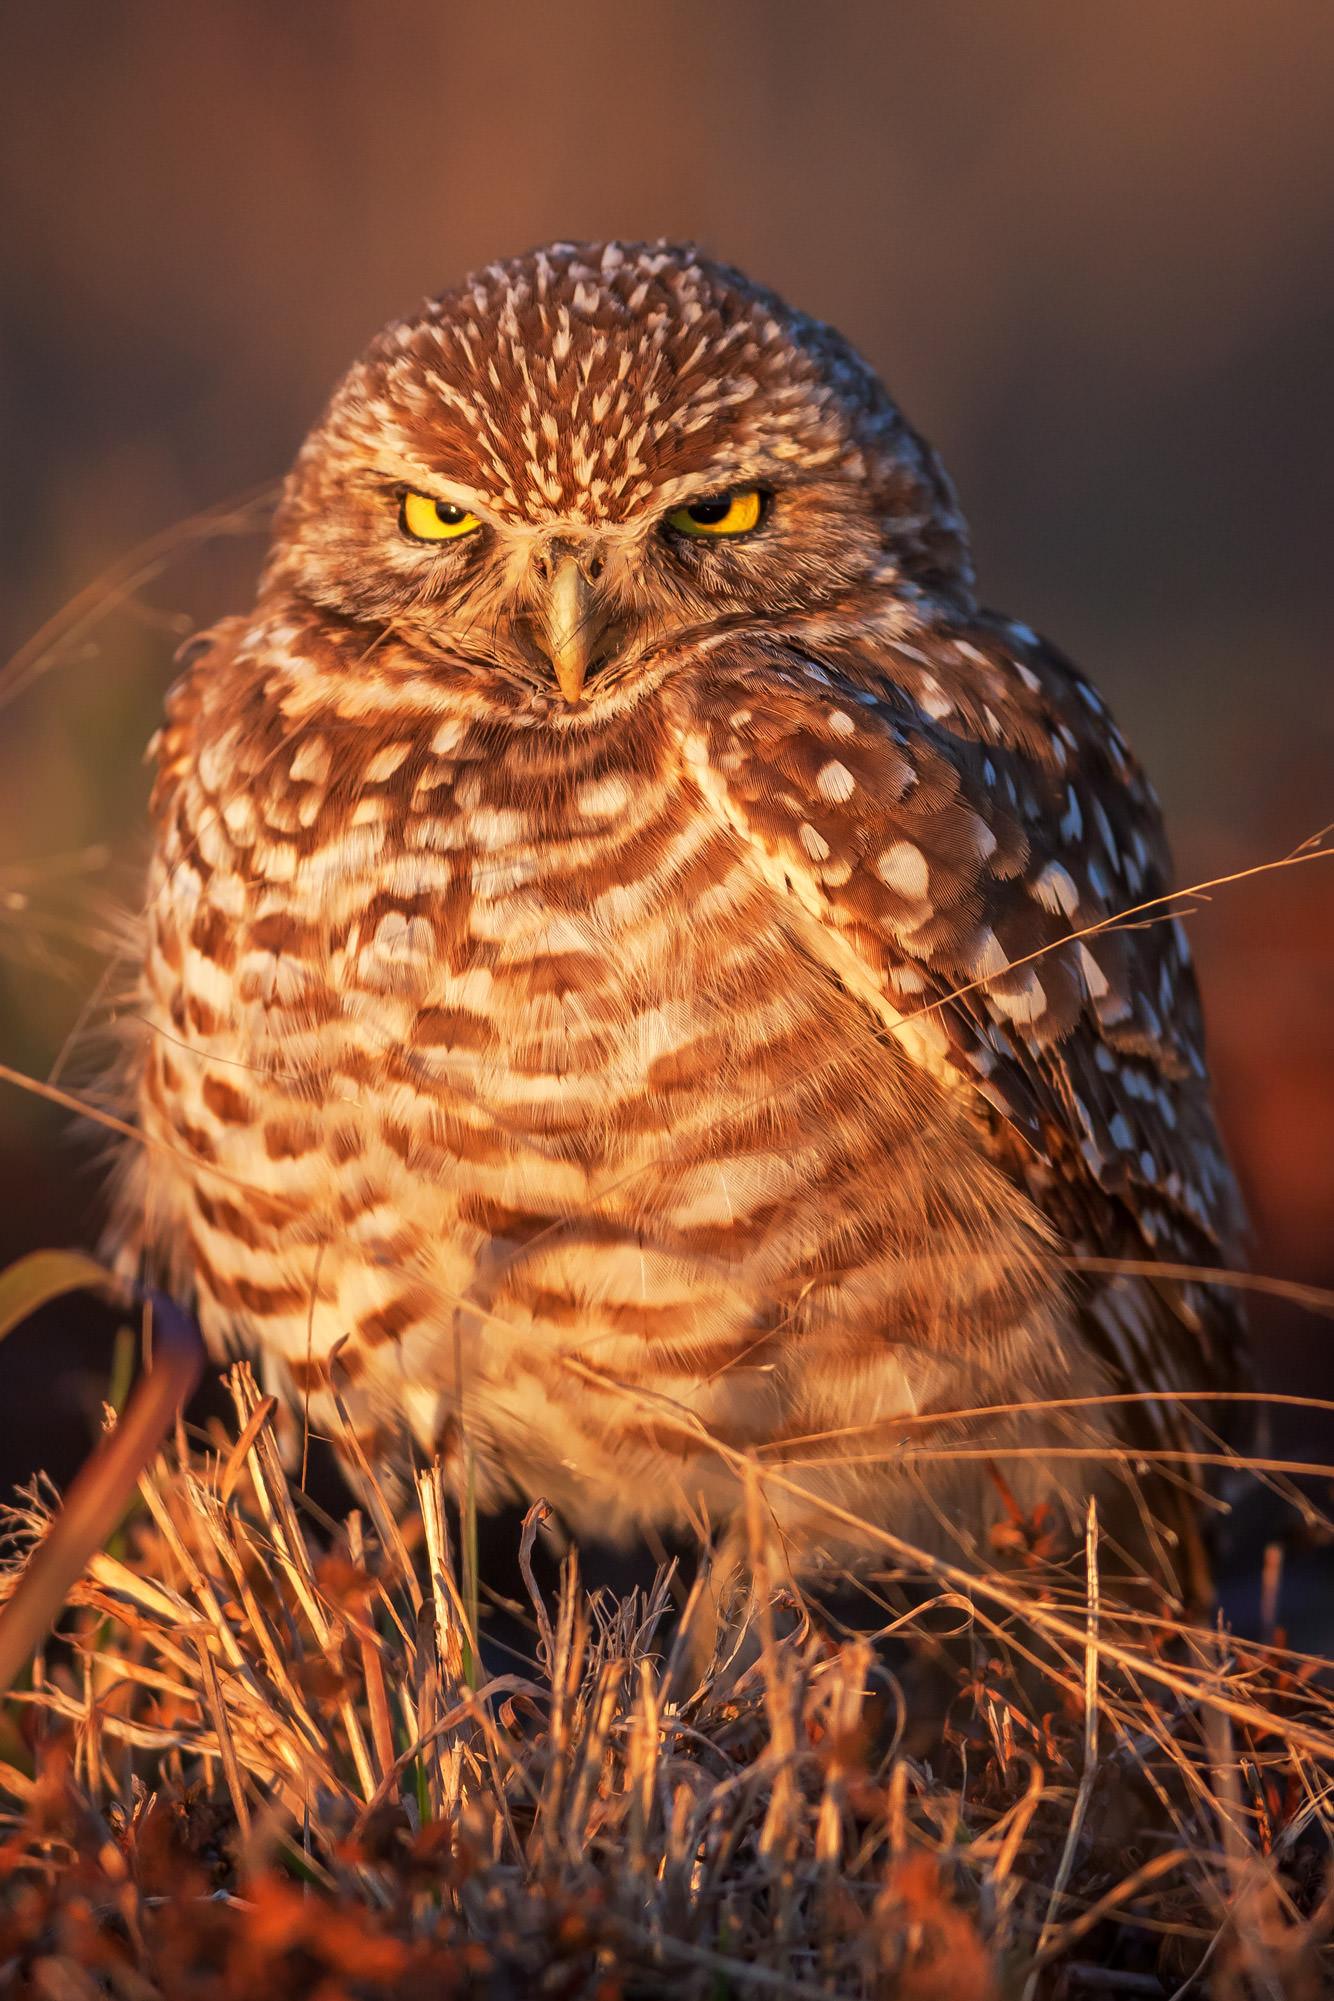 Owl, Burrowing Owl, Florida, photo